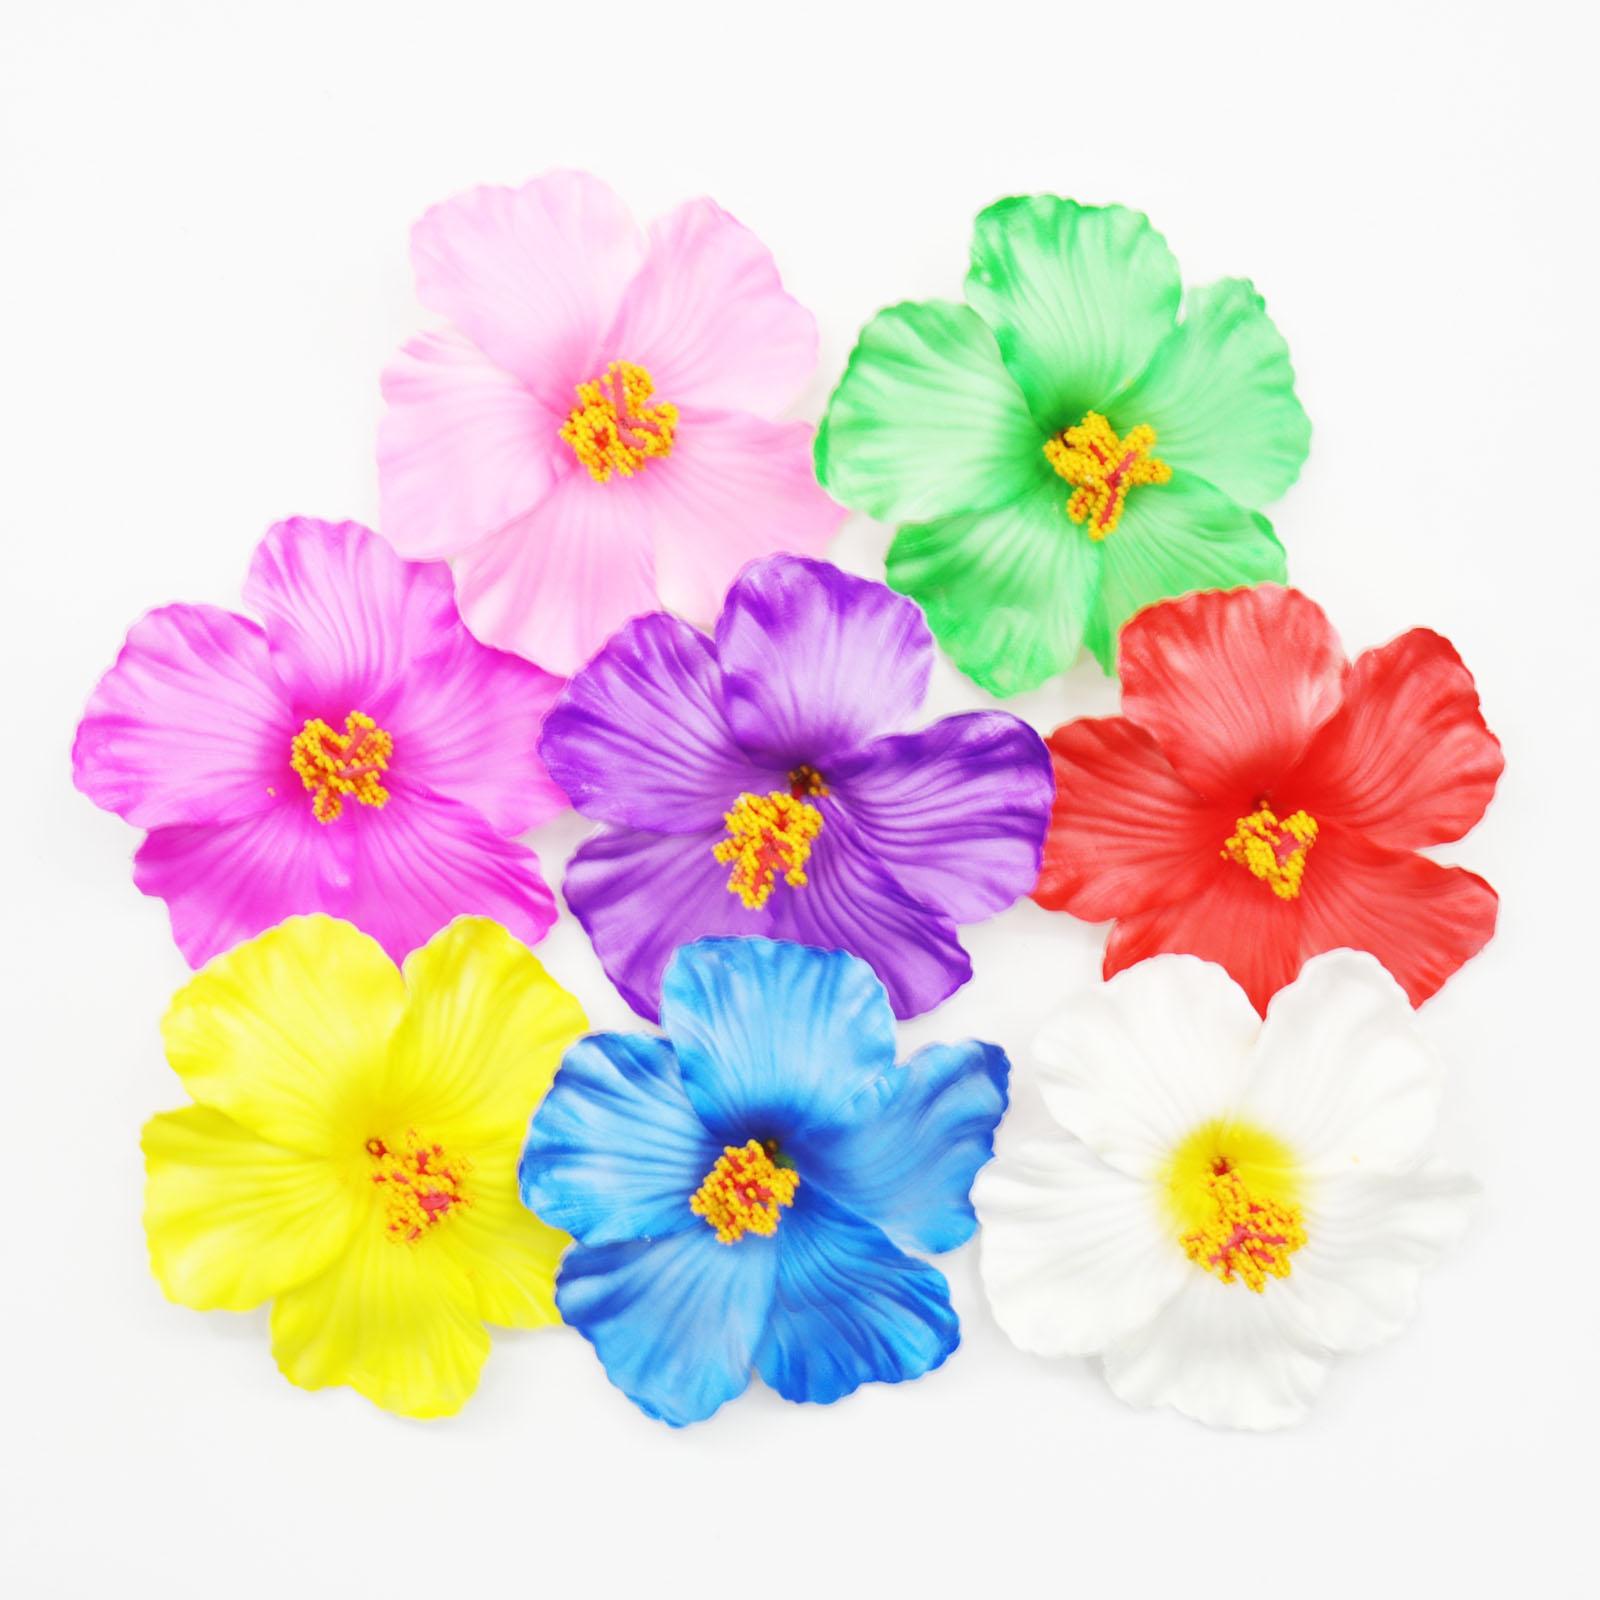 10-100pc Artificial Hibiscus Flowers Heads Hawiian Plumeria Flower Wedding Decor